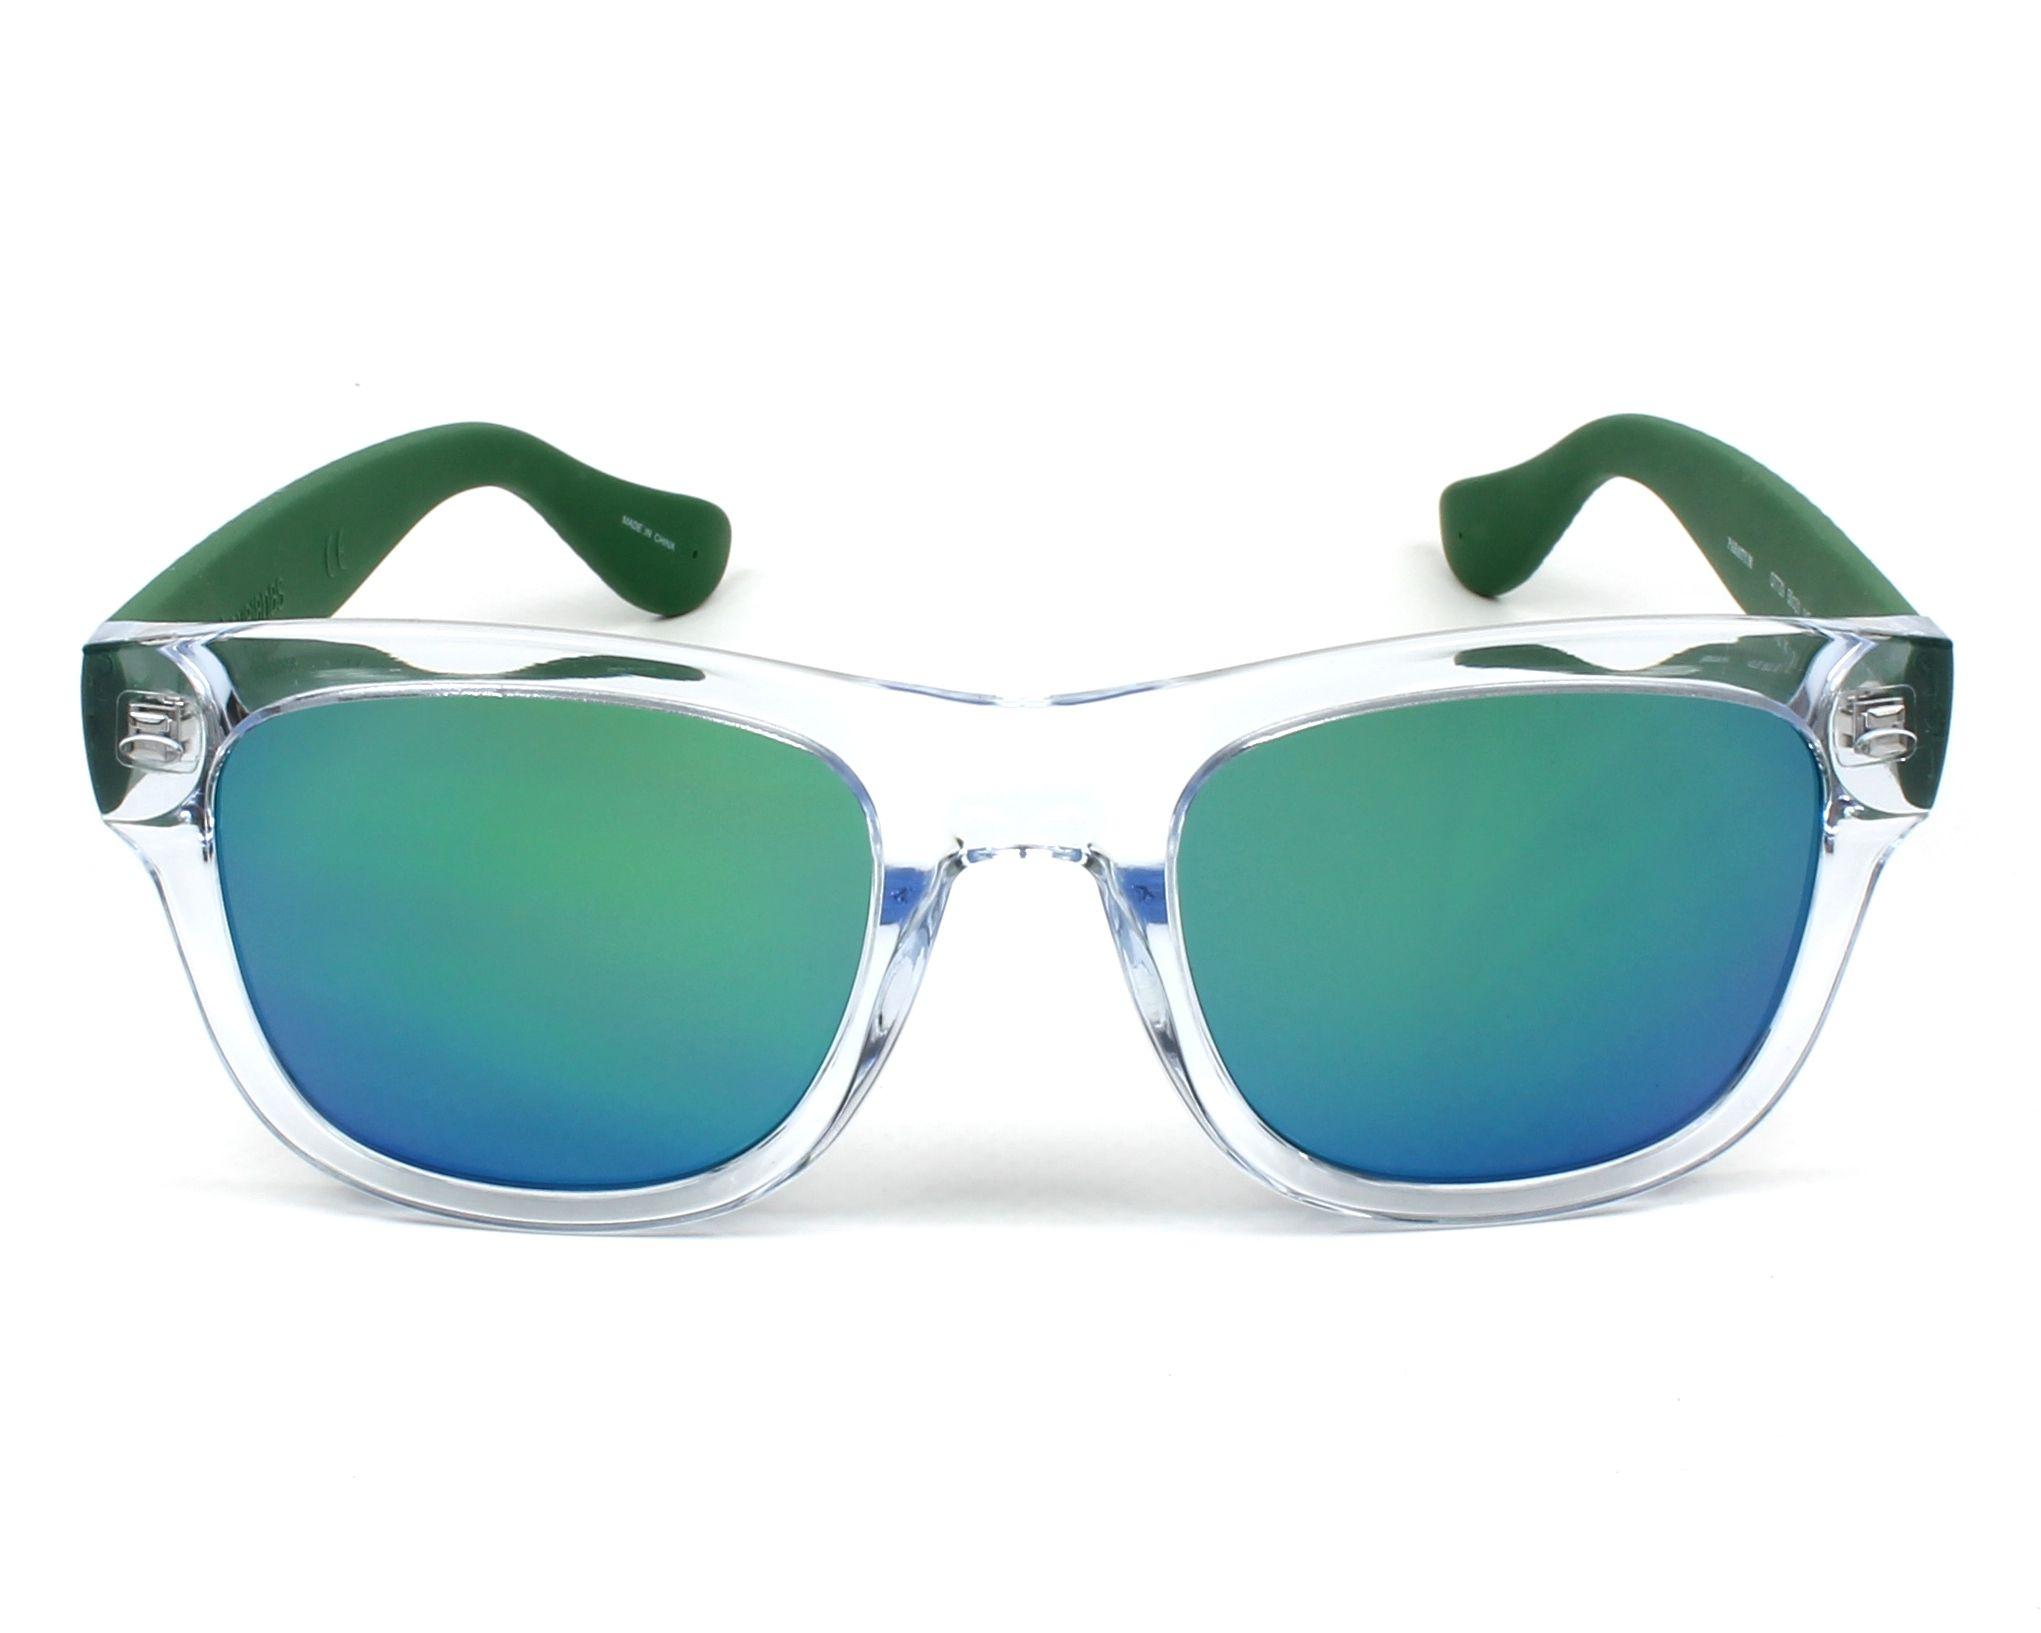 3a3bba85a5 Gafas de sol Havaianas PARATY-M QTT/Z9 50-21 Cristal Verde vista